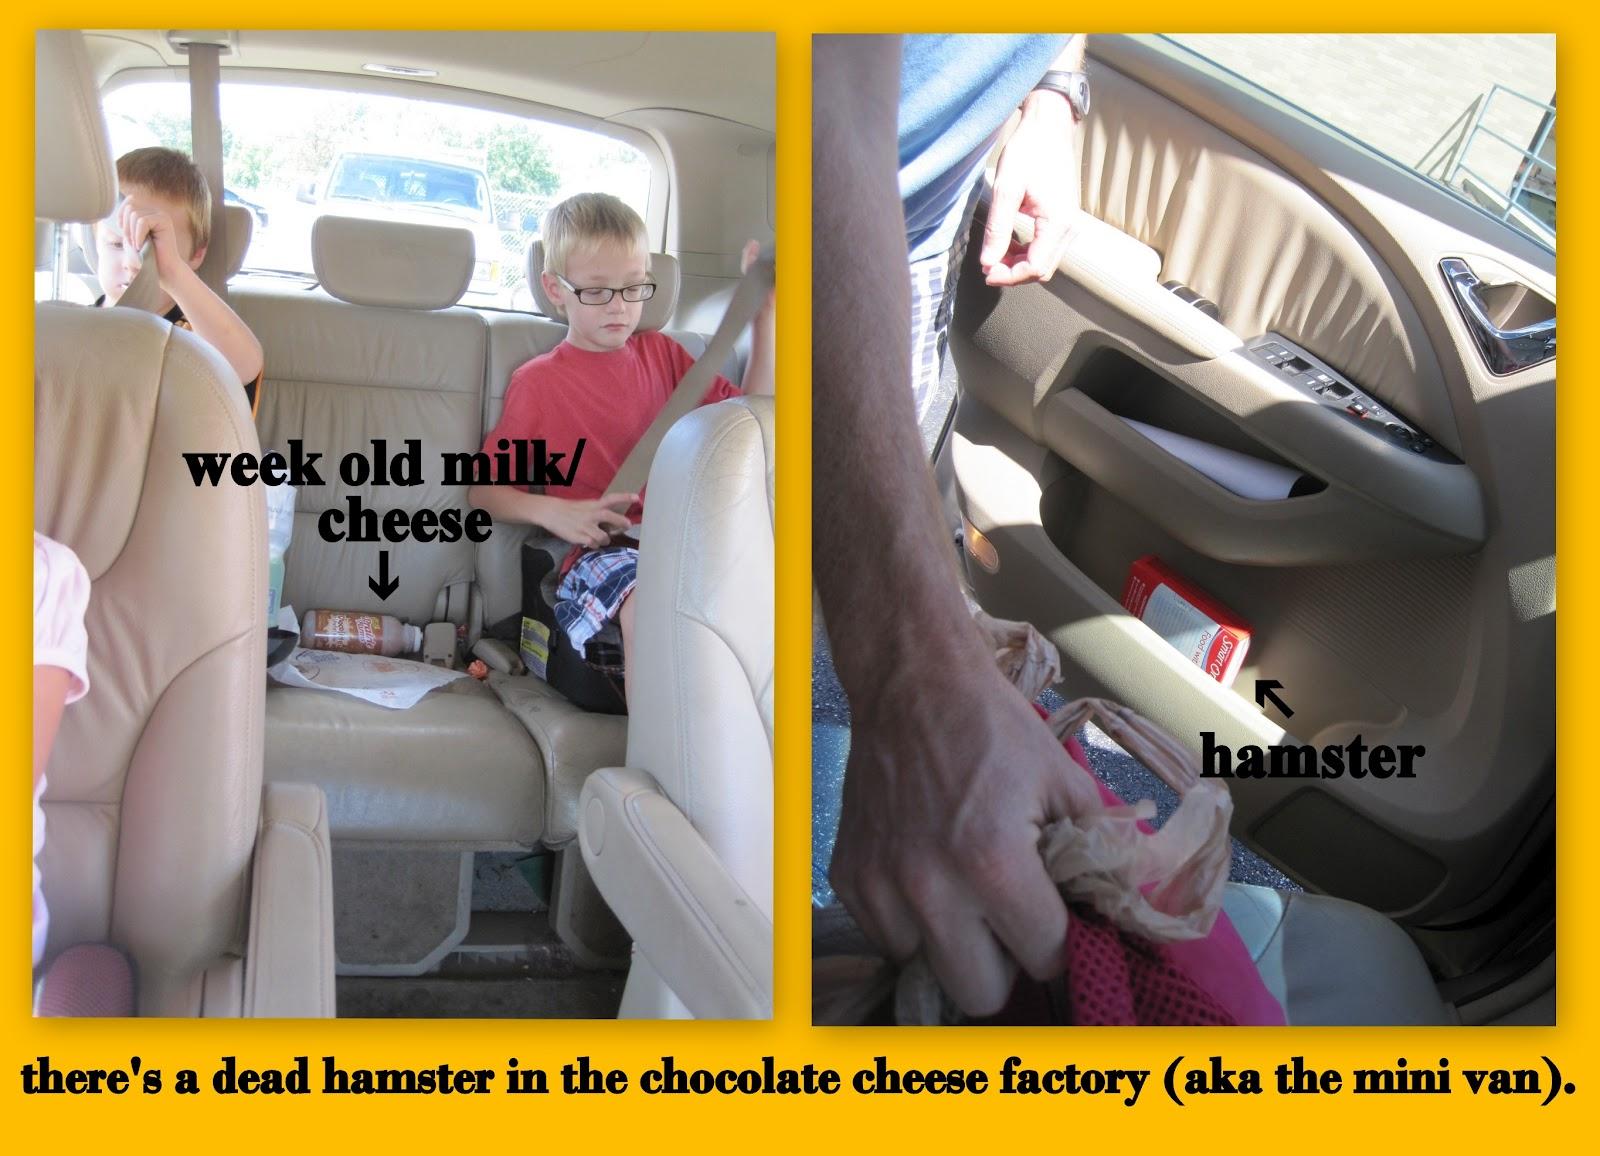 http://4.bp.blogspot.com/-nx4vAgSCmf4/UE4_zsYqM3I/AAAAAAAAEBA/tne2e_Ps99o/s1600/hamster+milk.jpg